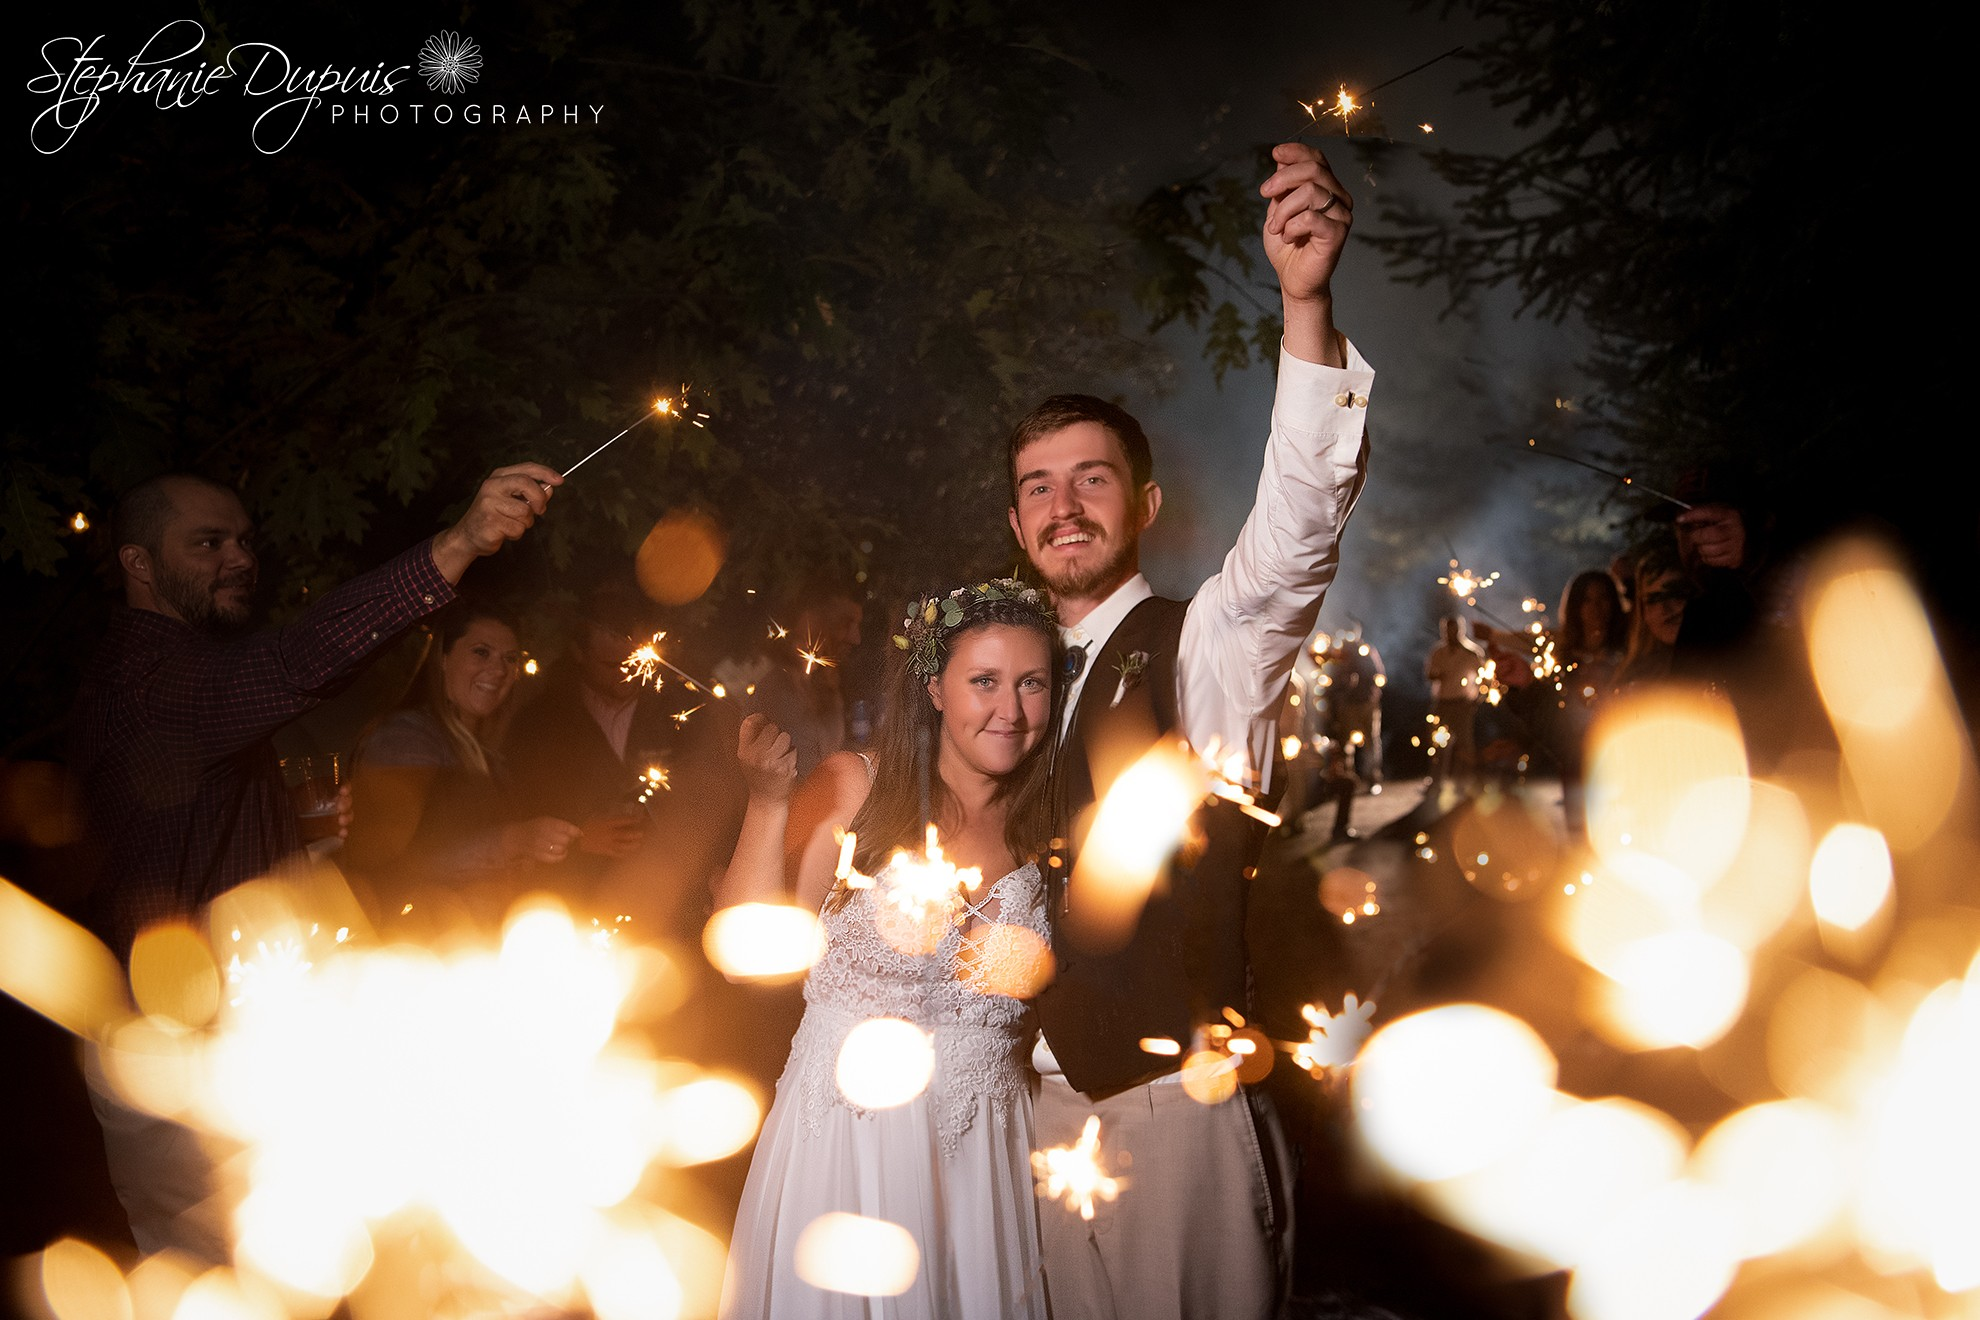 Hicks Wedding 23 - Portfolio: Hick's Wedding